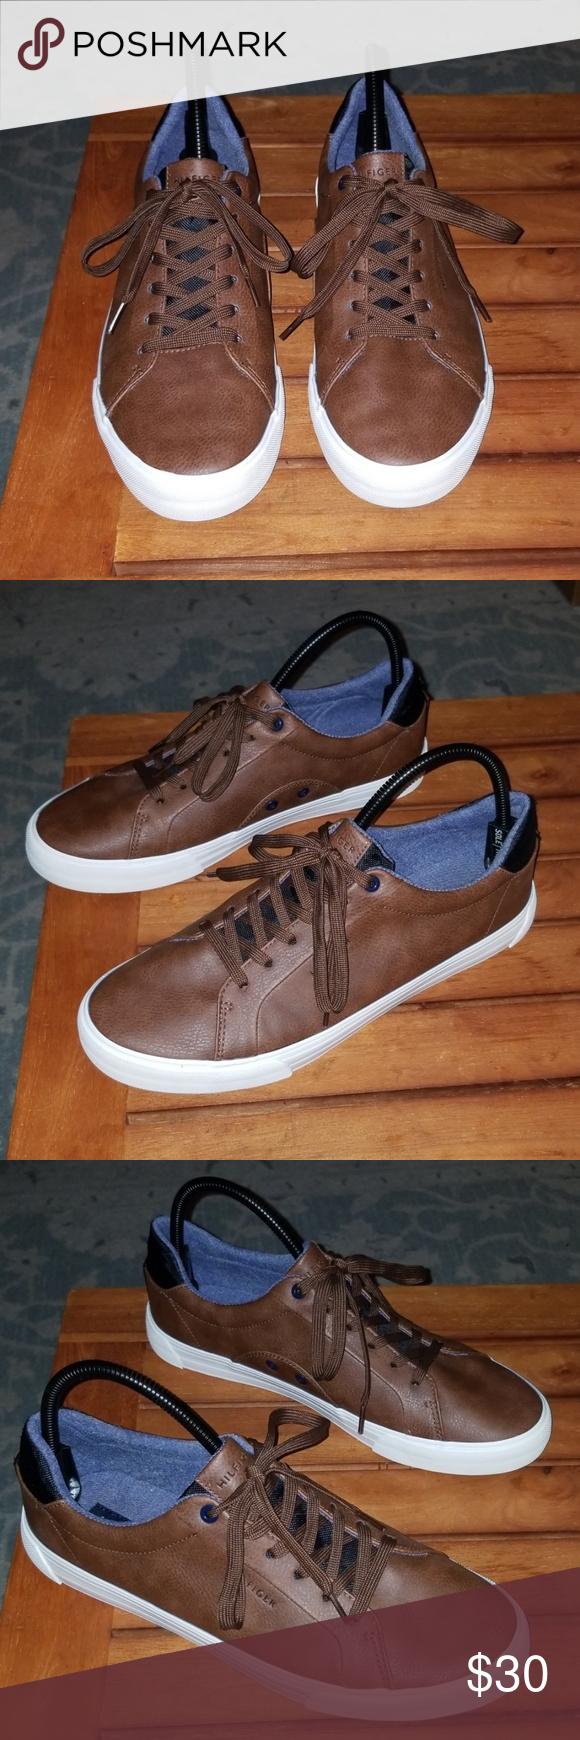 Tommy Hilfiger Rance Sneaker size 10.5